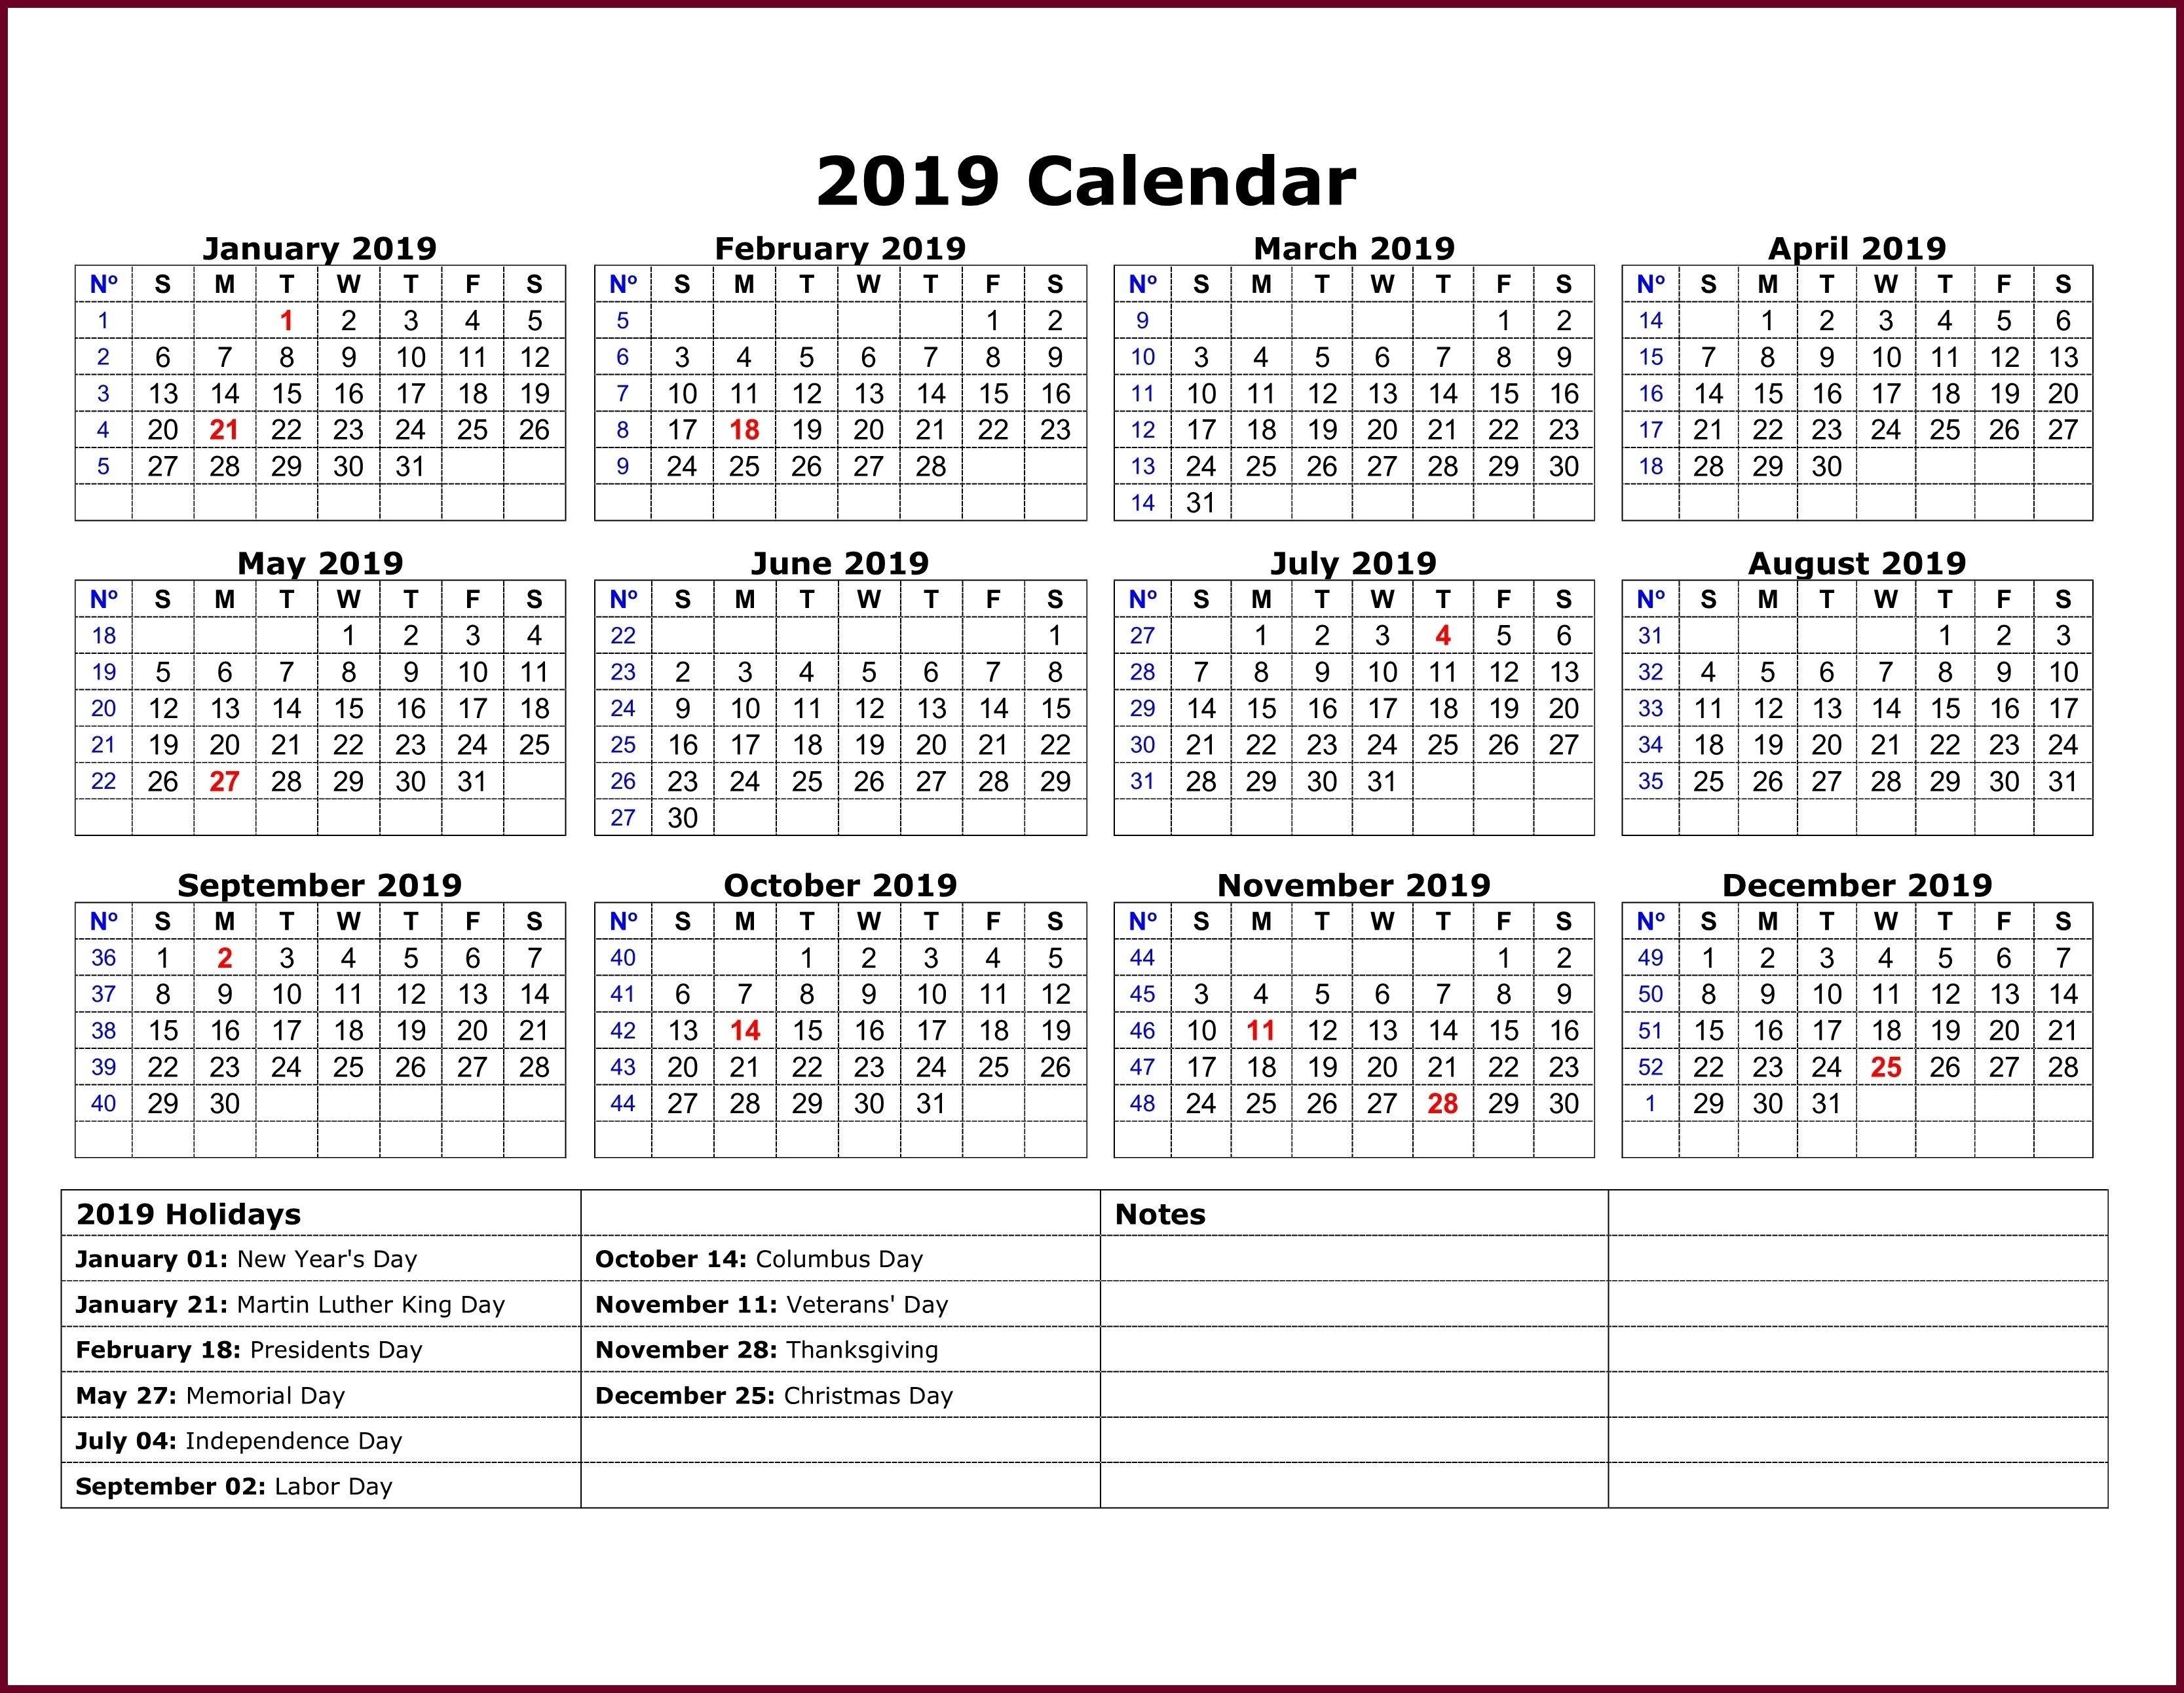 Calendar 2019 Template Excel | 2019 Calendar Template In One Pages Calendar 2019 Template Excel